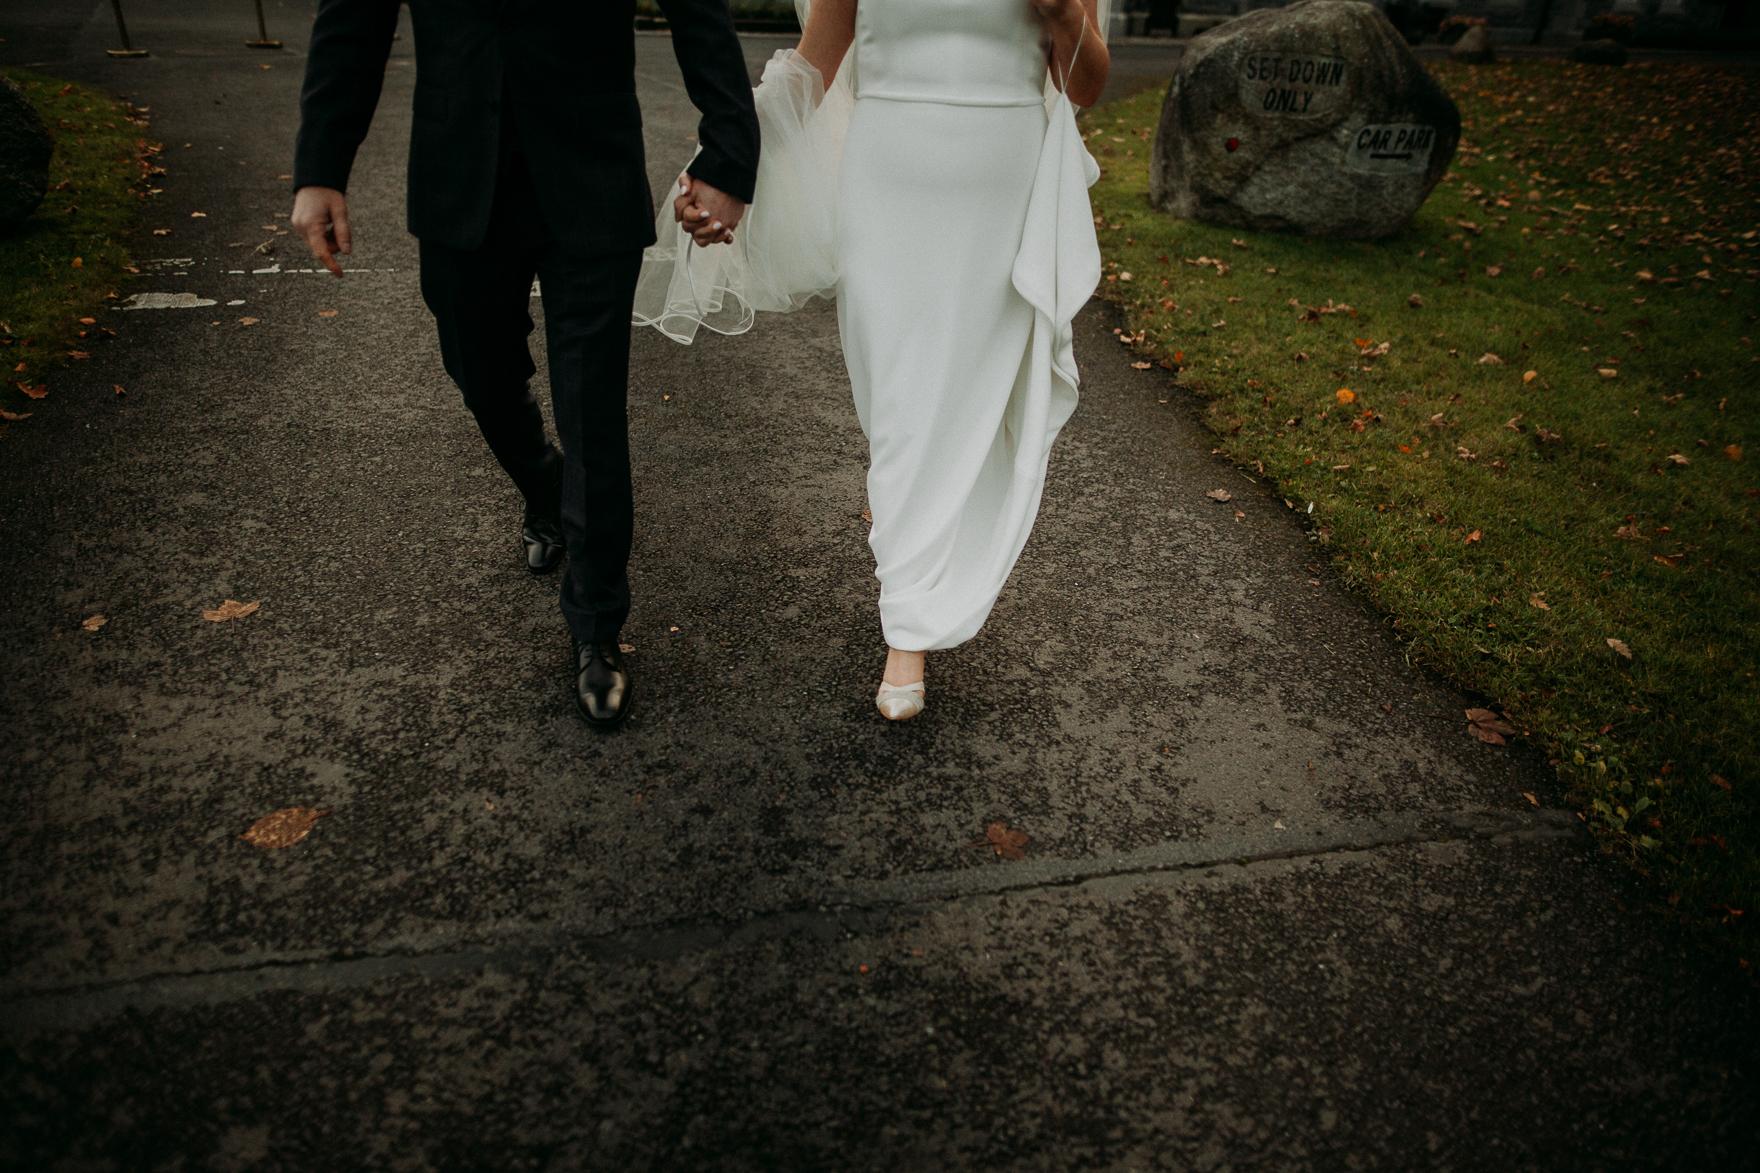 A man and a woman walking down a sidewalk